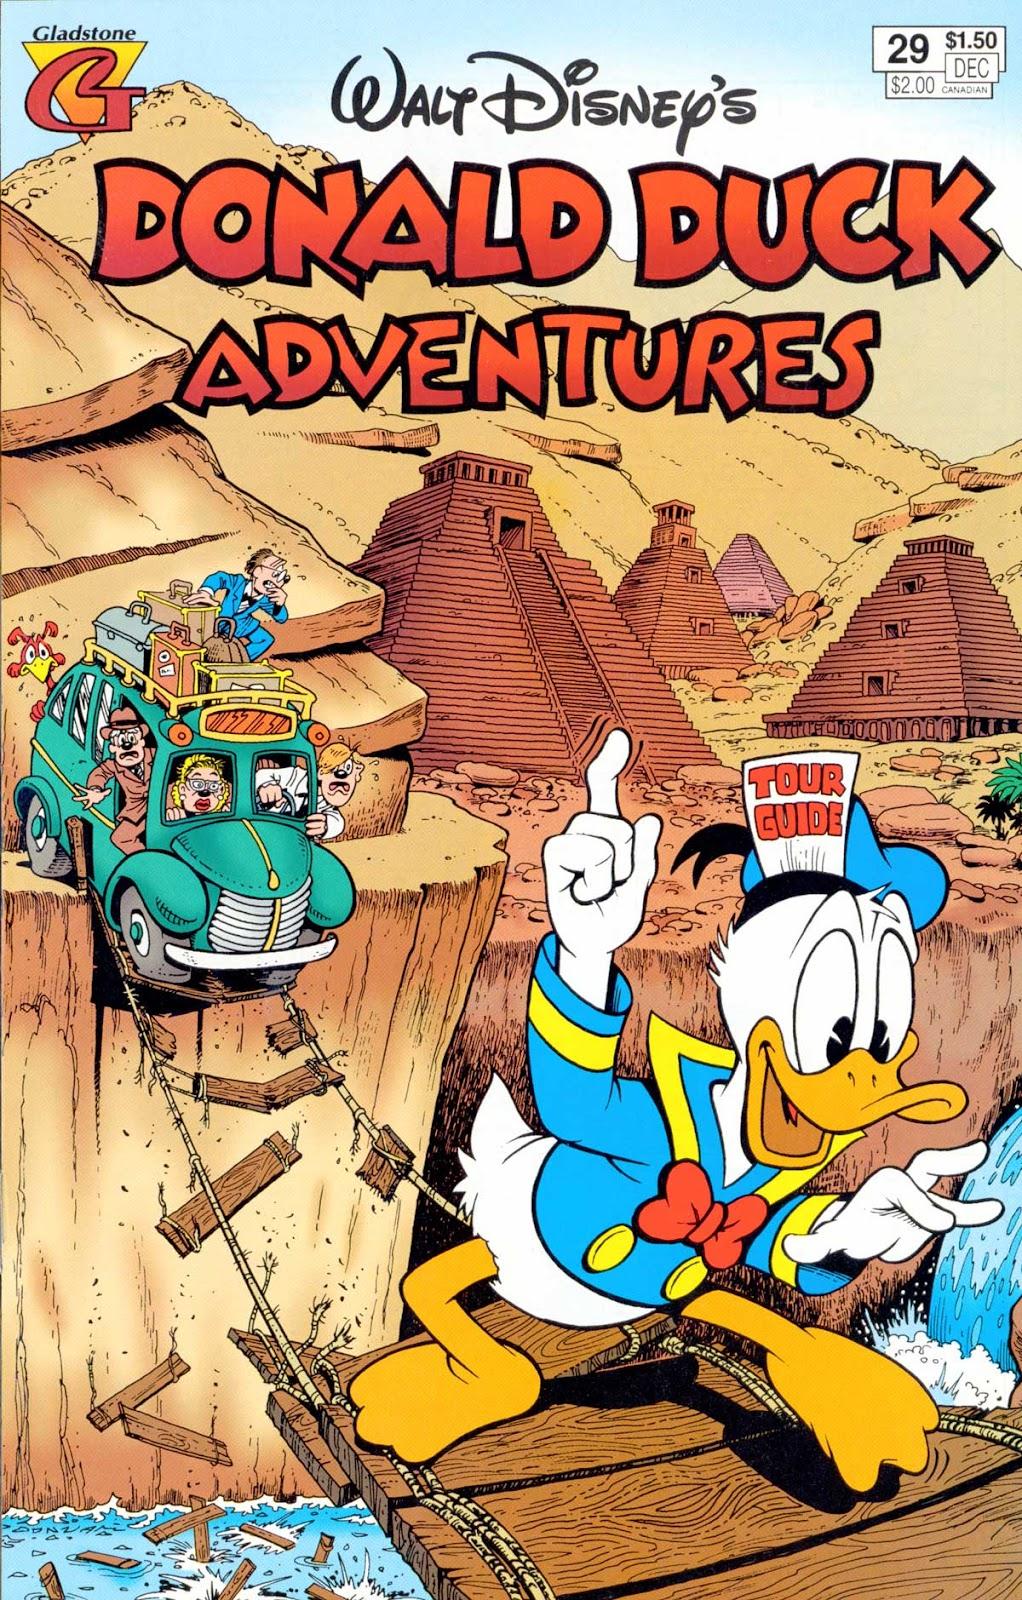 Walt Disney's Donald Duck Adventures (1987) issue 29 - Page 1